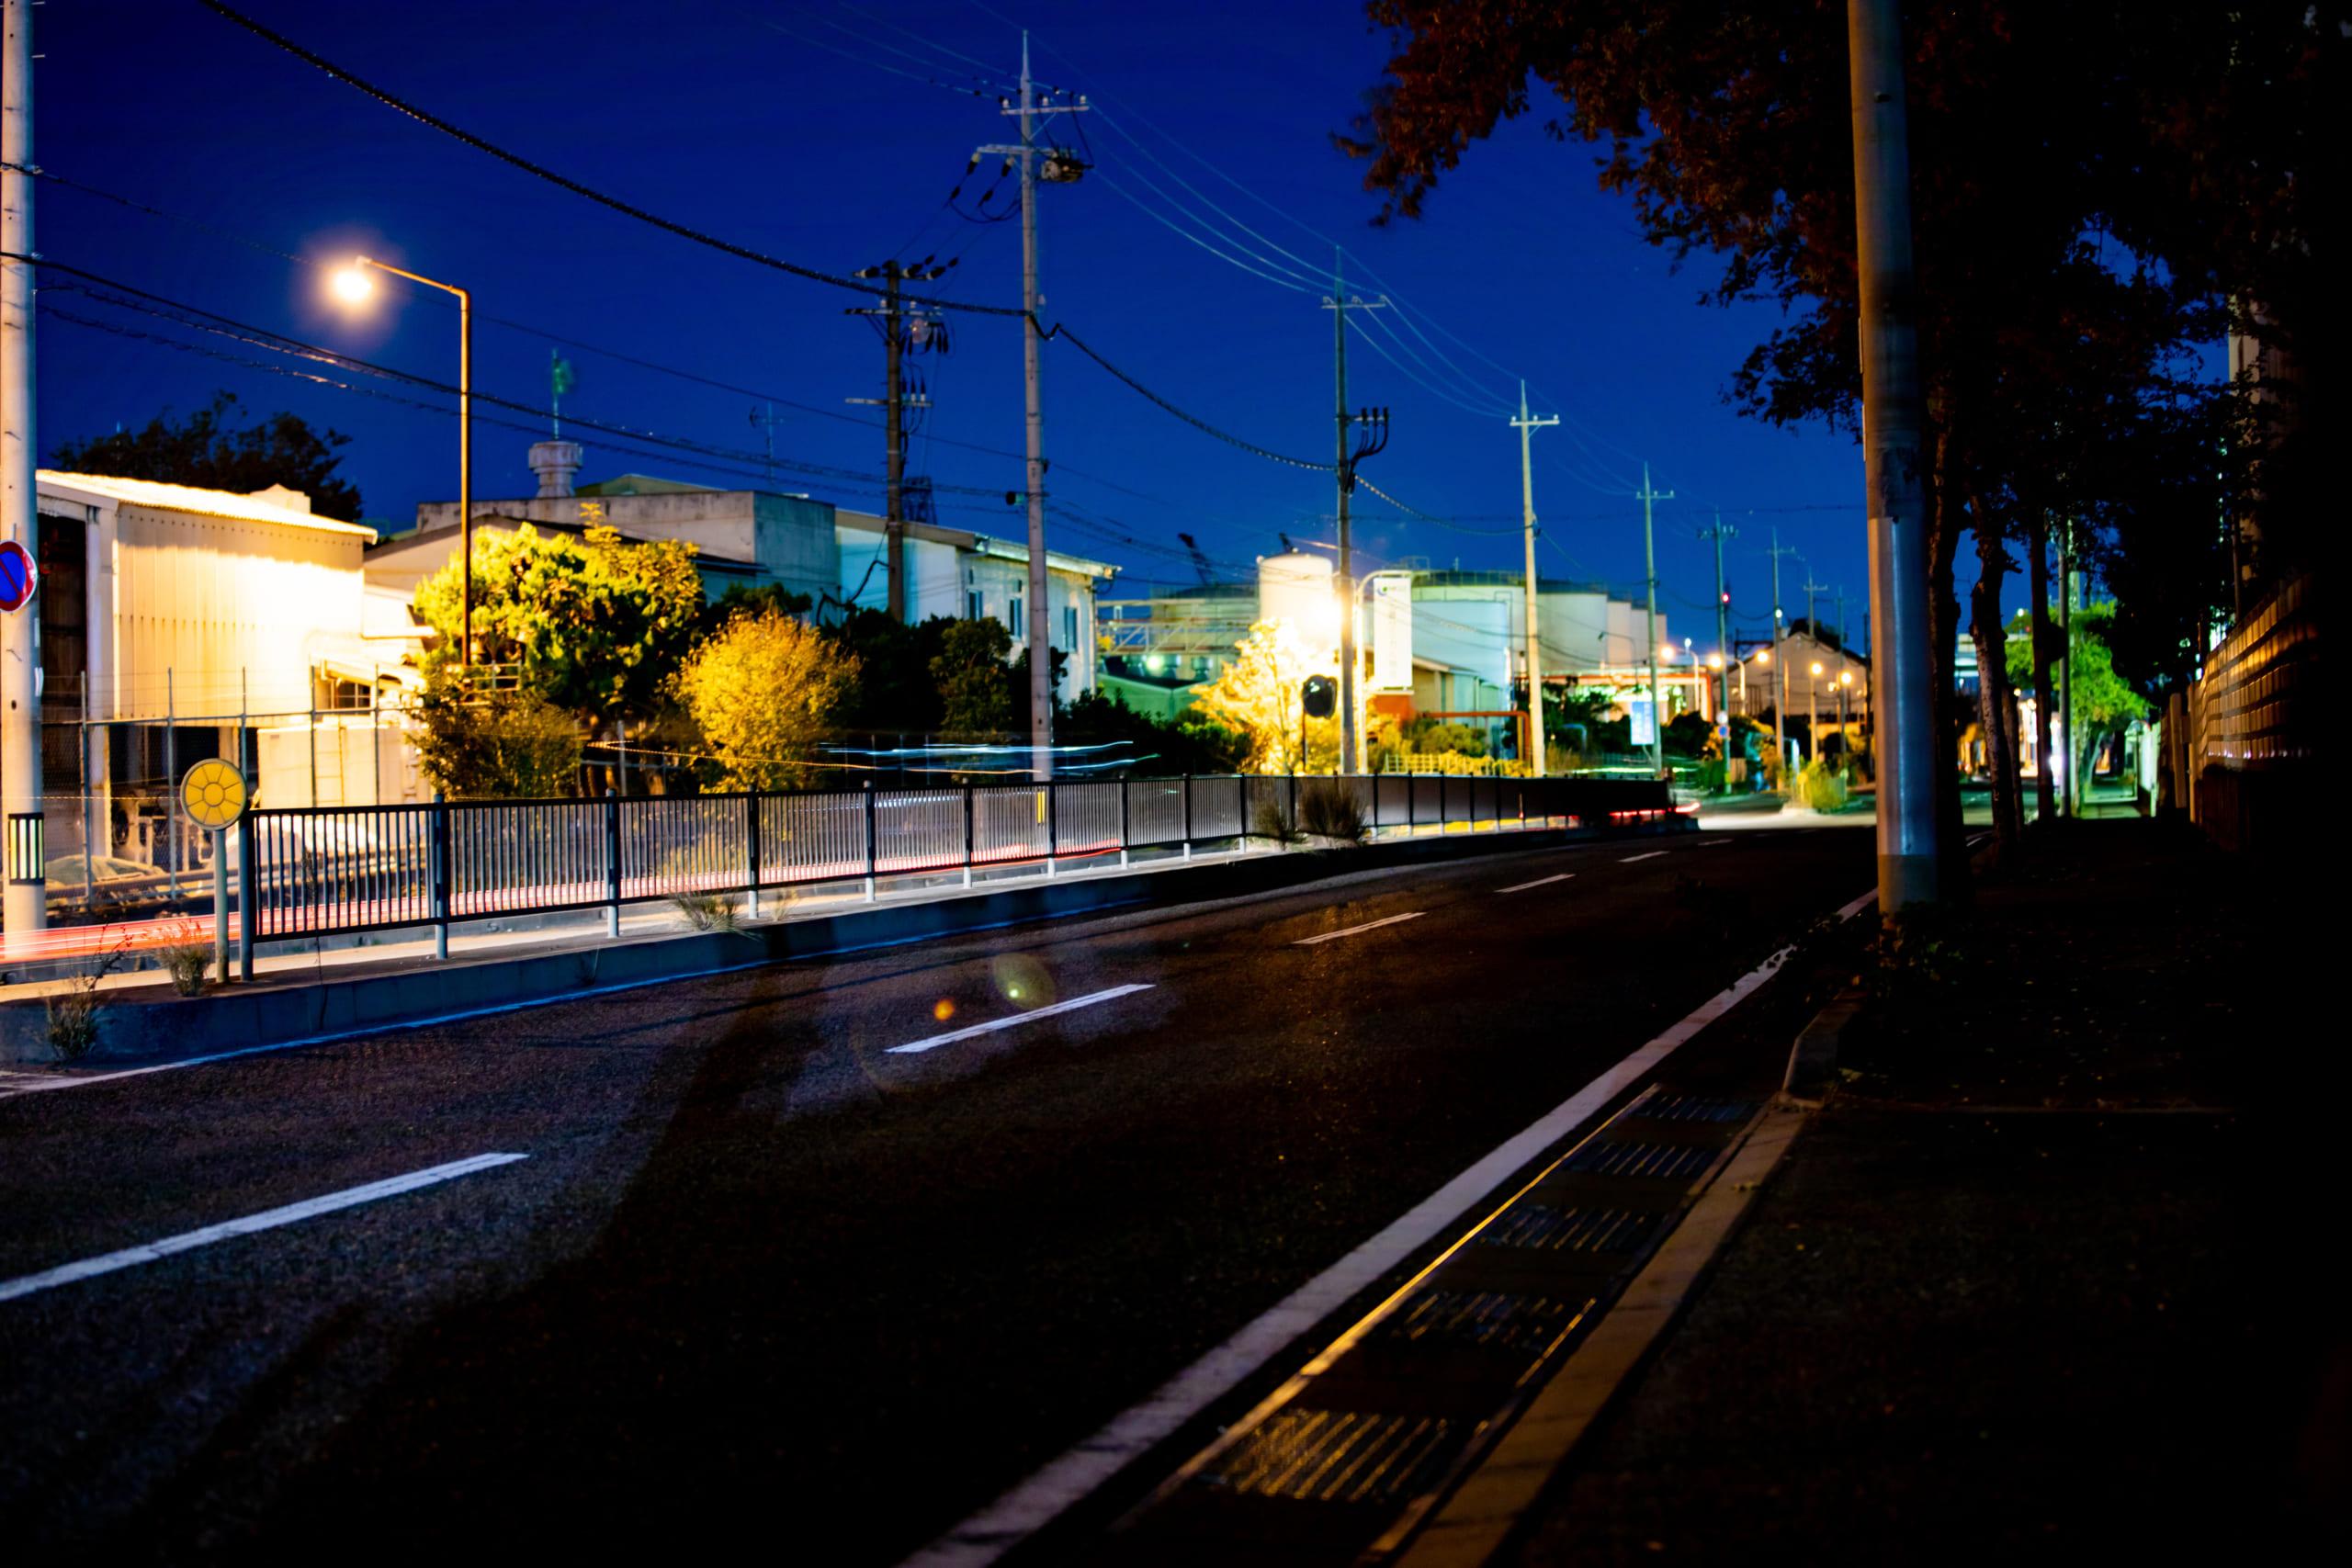 レンゴー尼崎工場:工場夜景写真